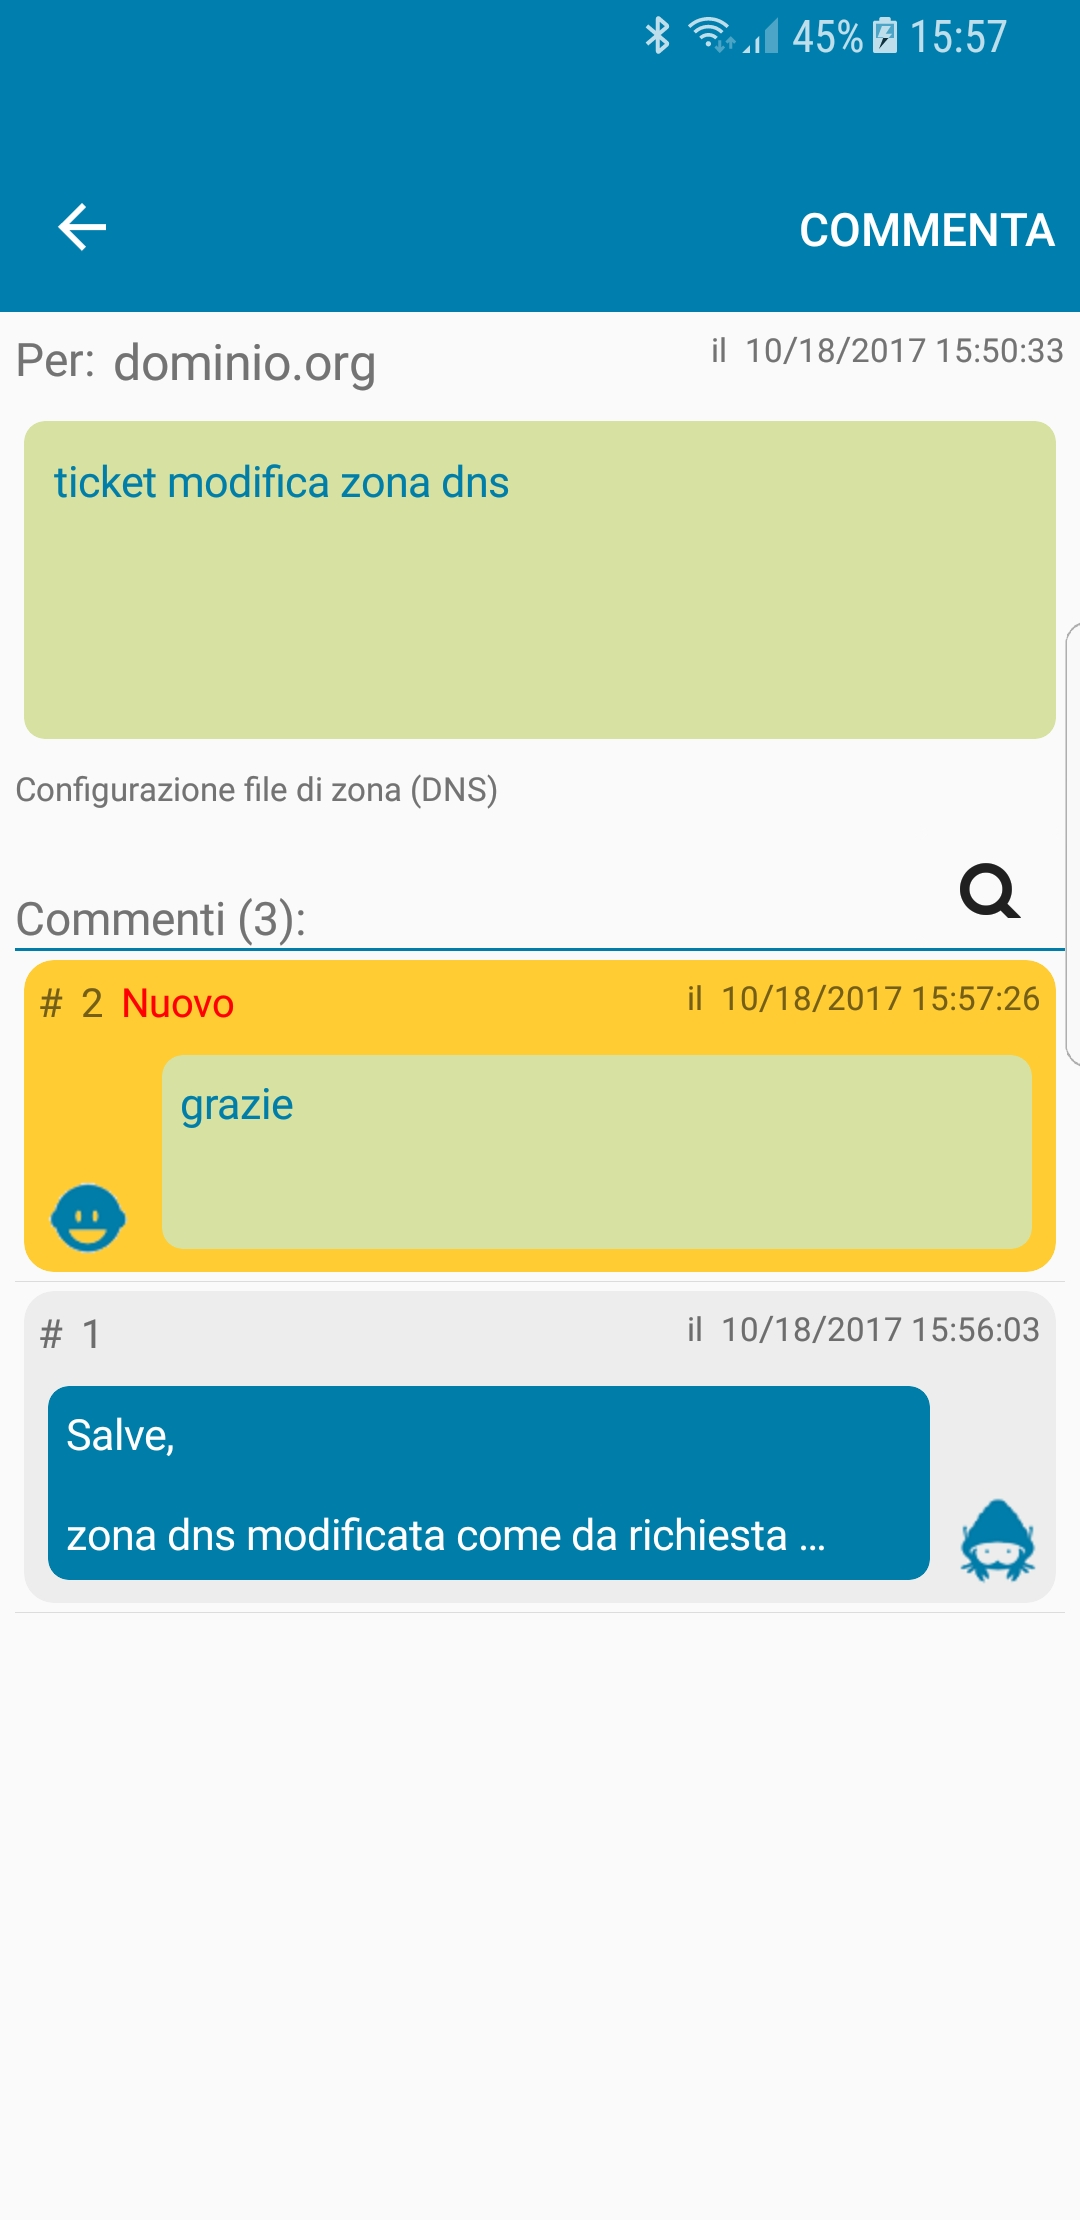 Server Mate App - commenti